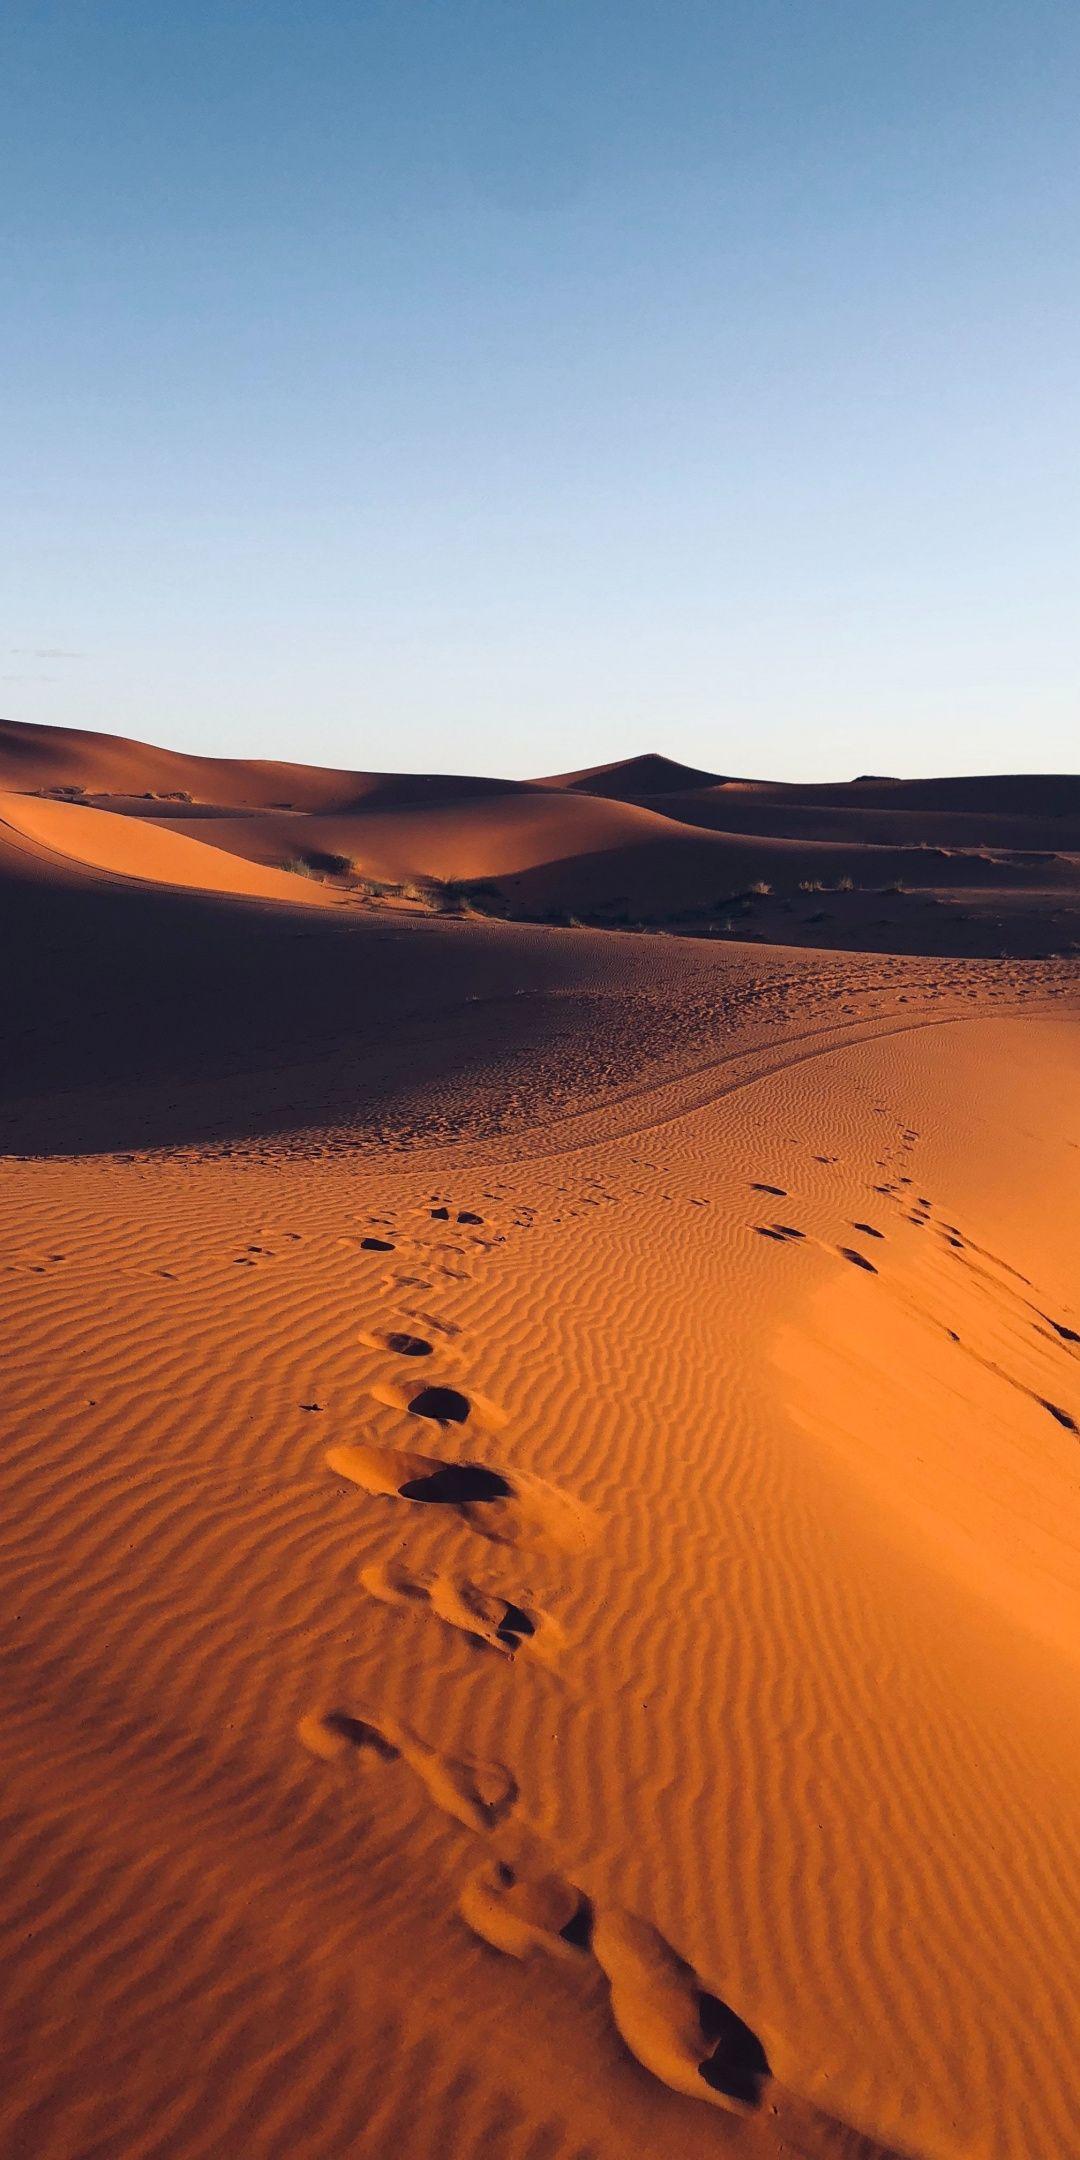 Morocco Marks Dunes Desert Sand 1080x2160 Wallpaper Desert Aesthetic Galaxy Phone Wallpaper Moonlight Photography